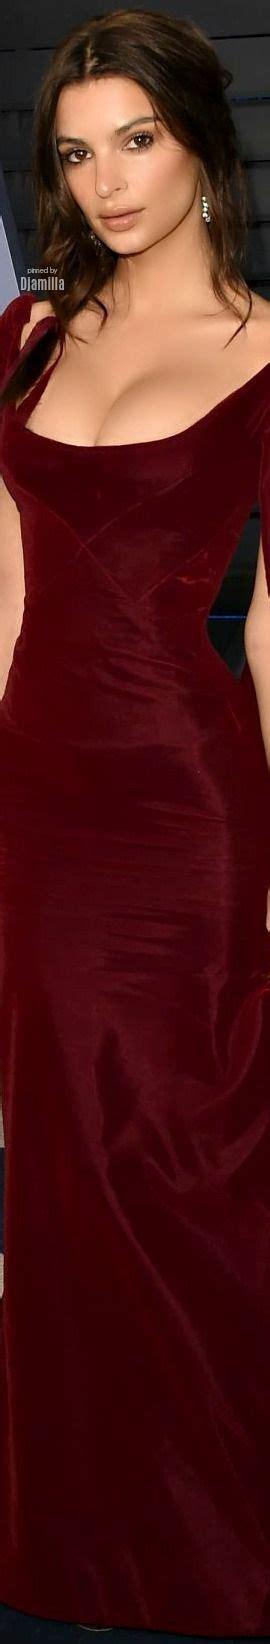 Emily Ratajkowski at 2018 Vanity Fair Oscar Party